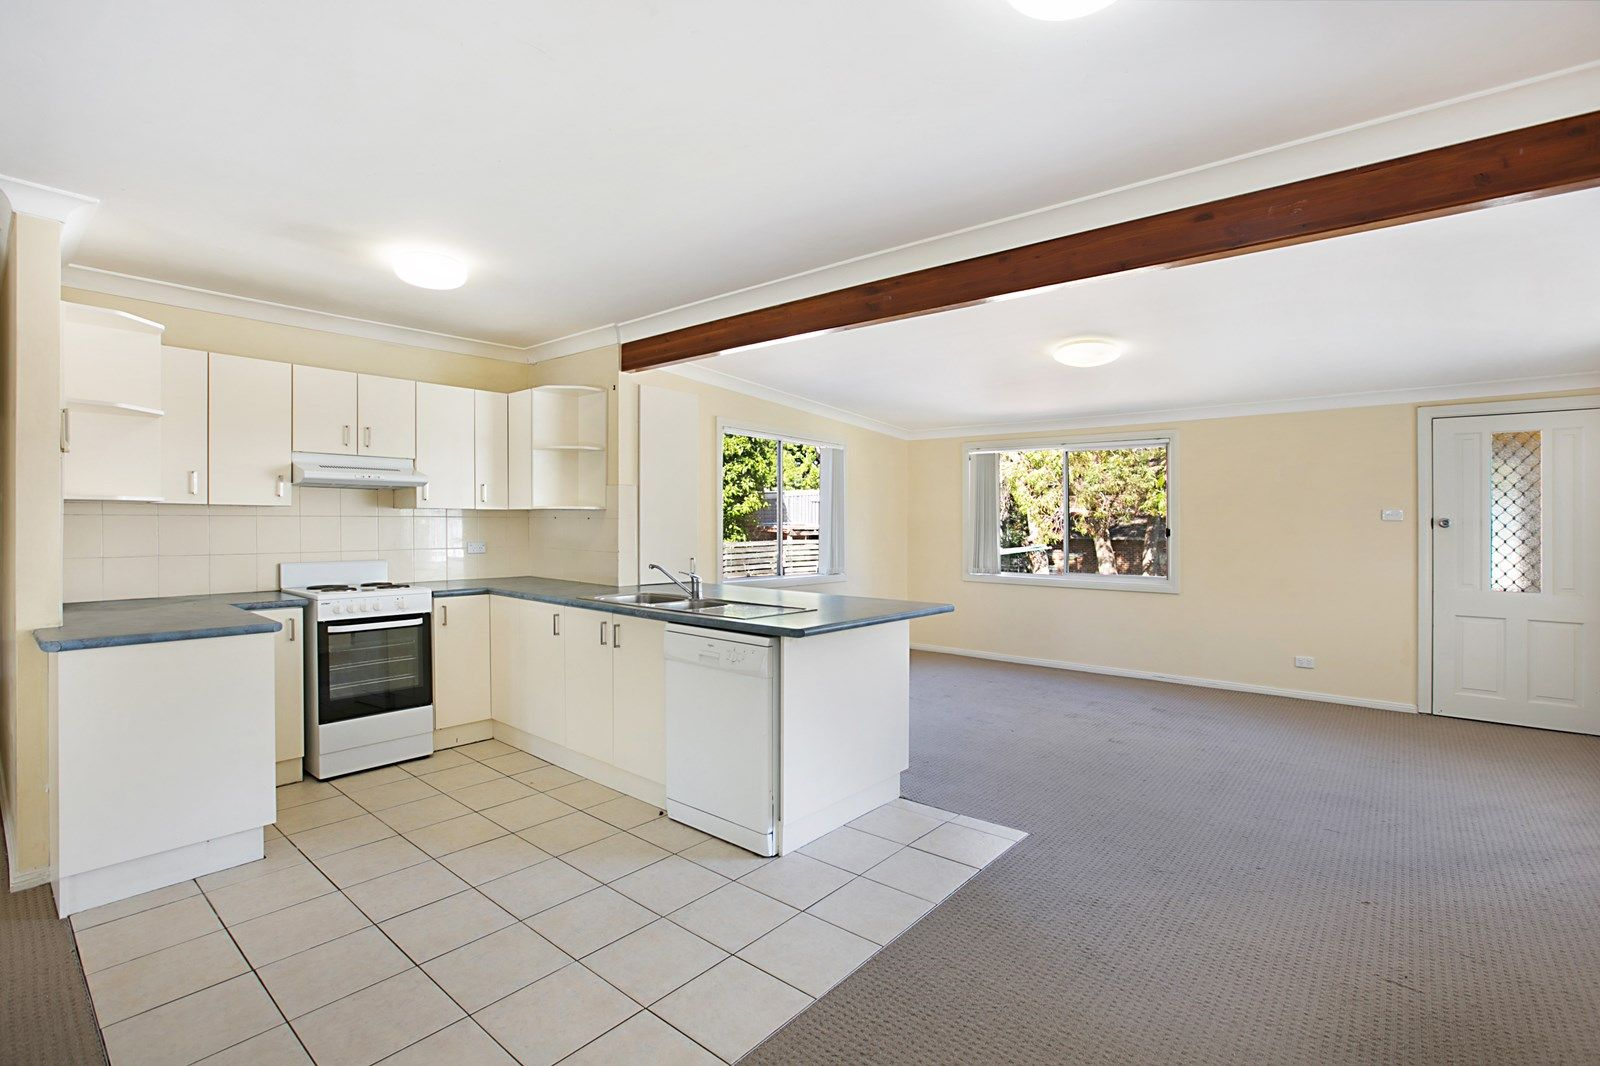 38 Binda St, Hawks Nest NSW 2324, Image 1